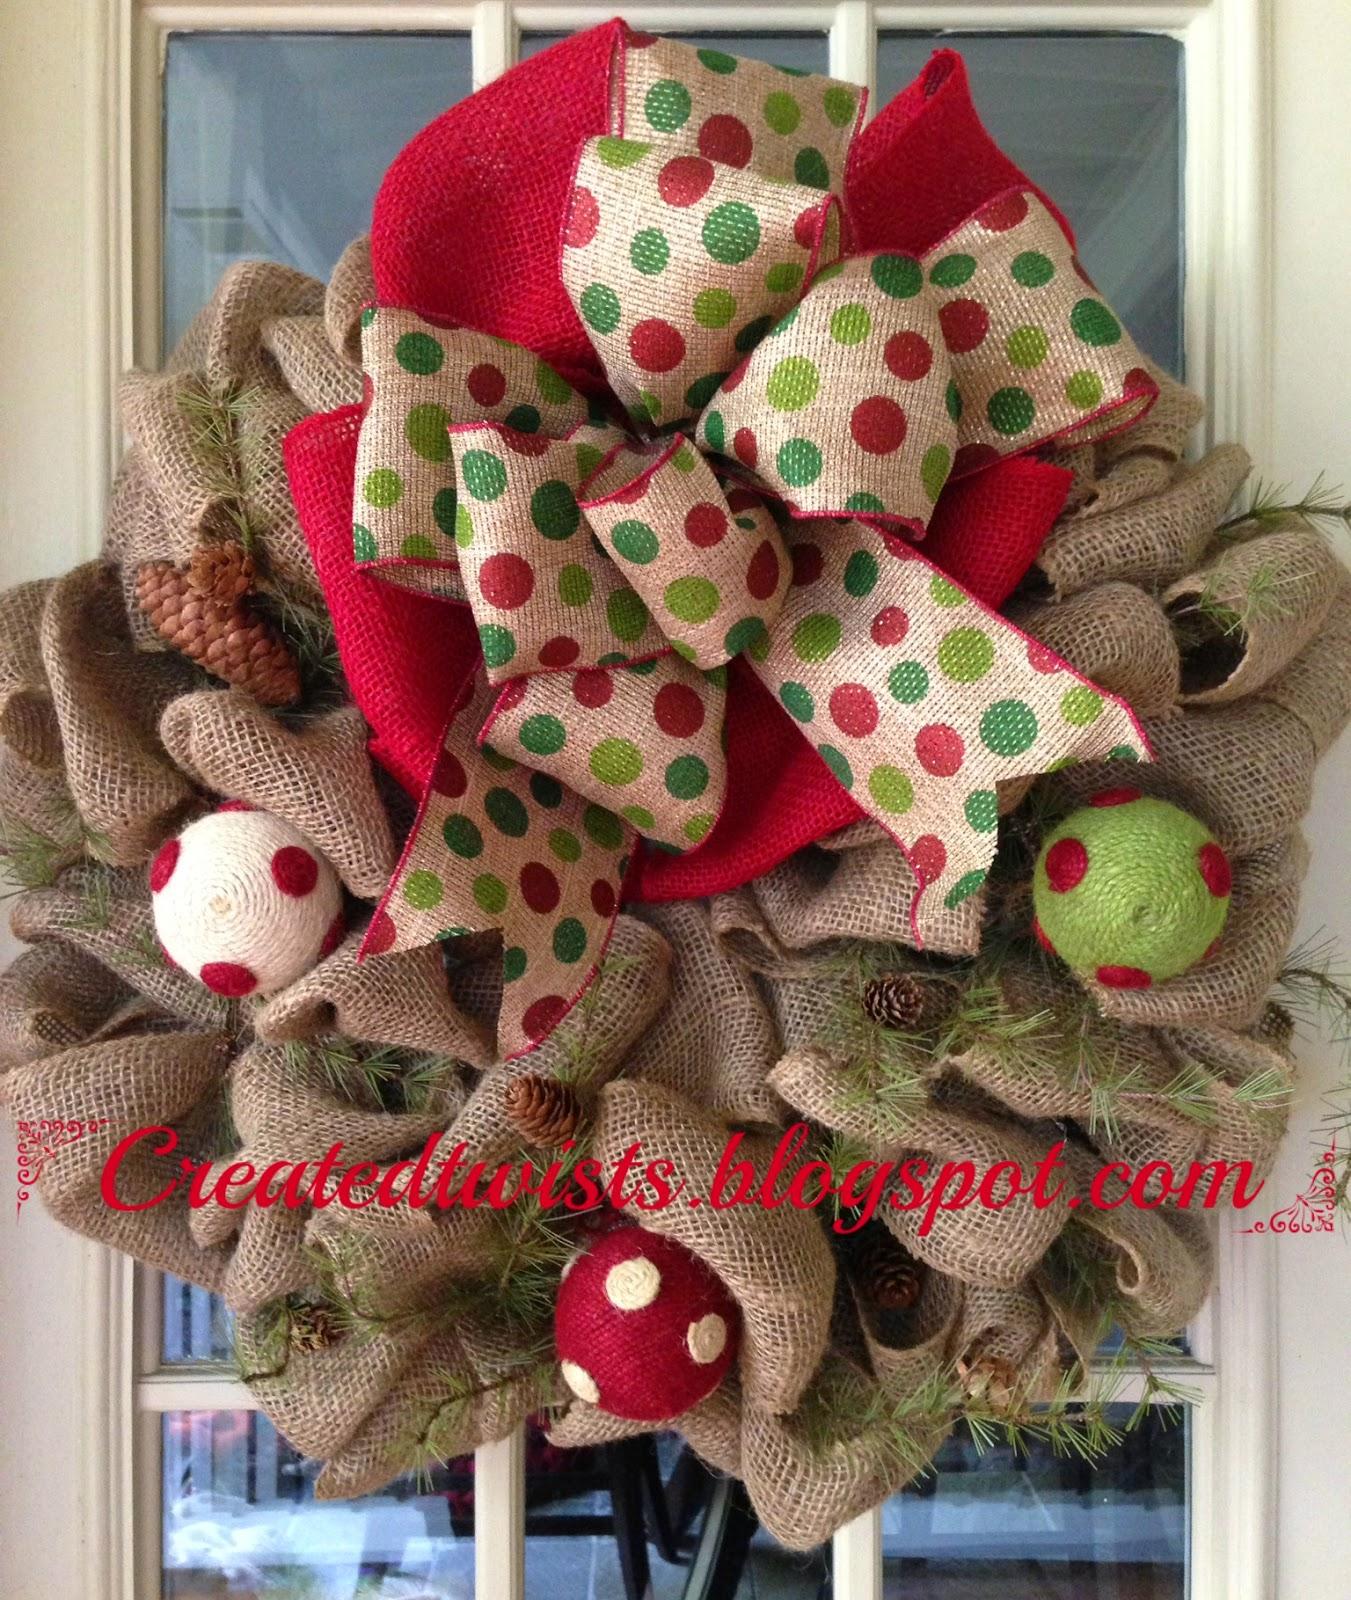 christmas burlap wreath with polka dot ribbon and polka dot ornaments - Christmas Burlap Wreath